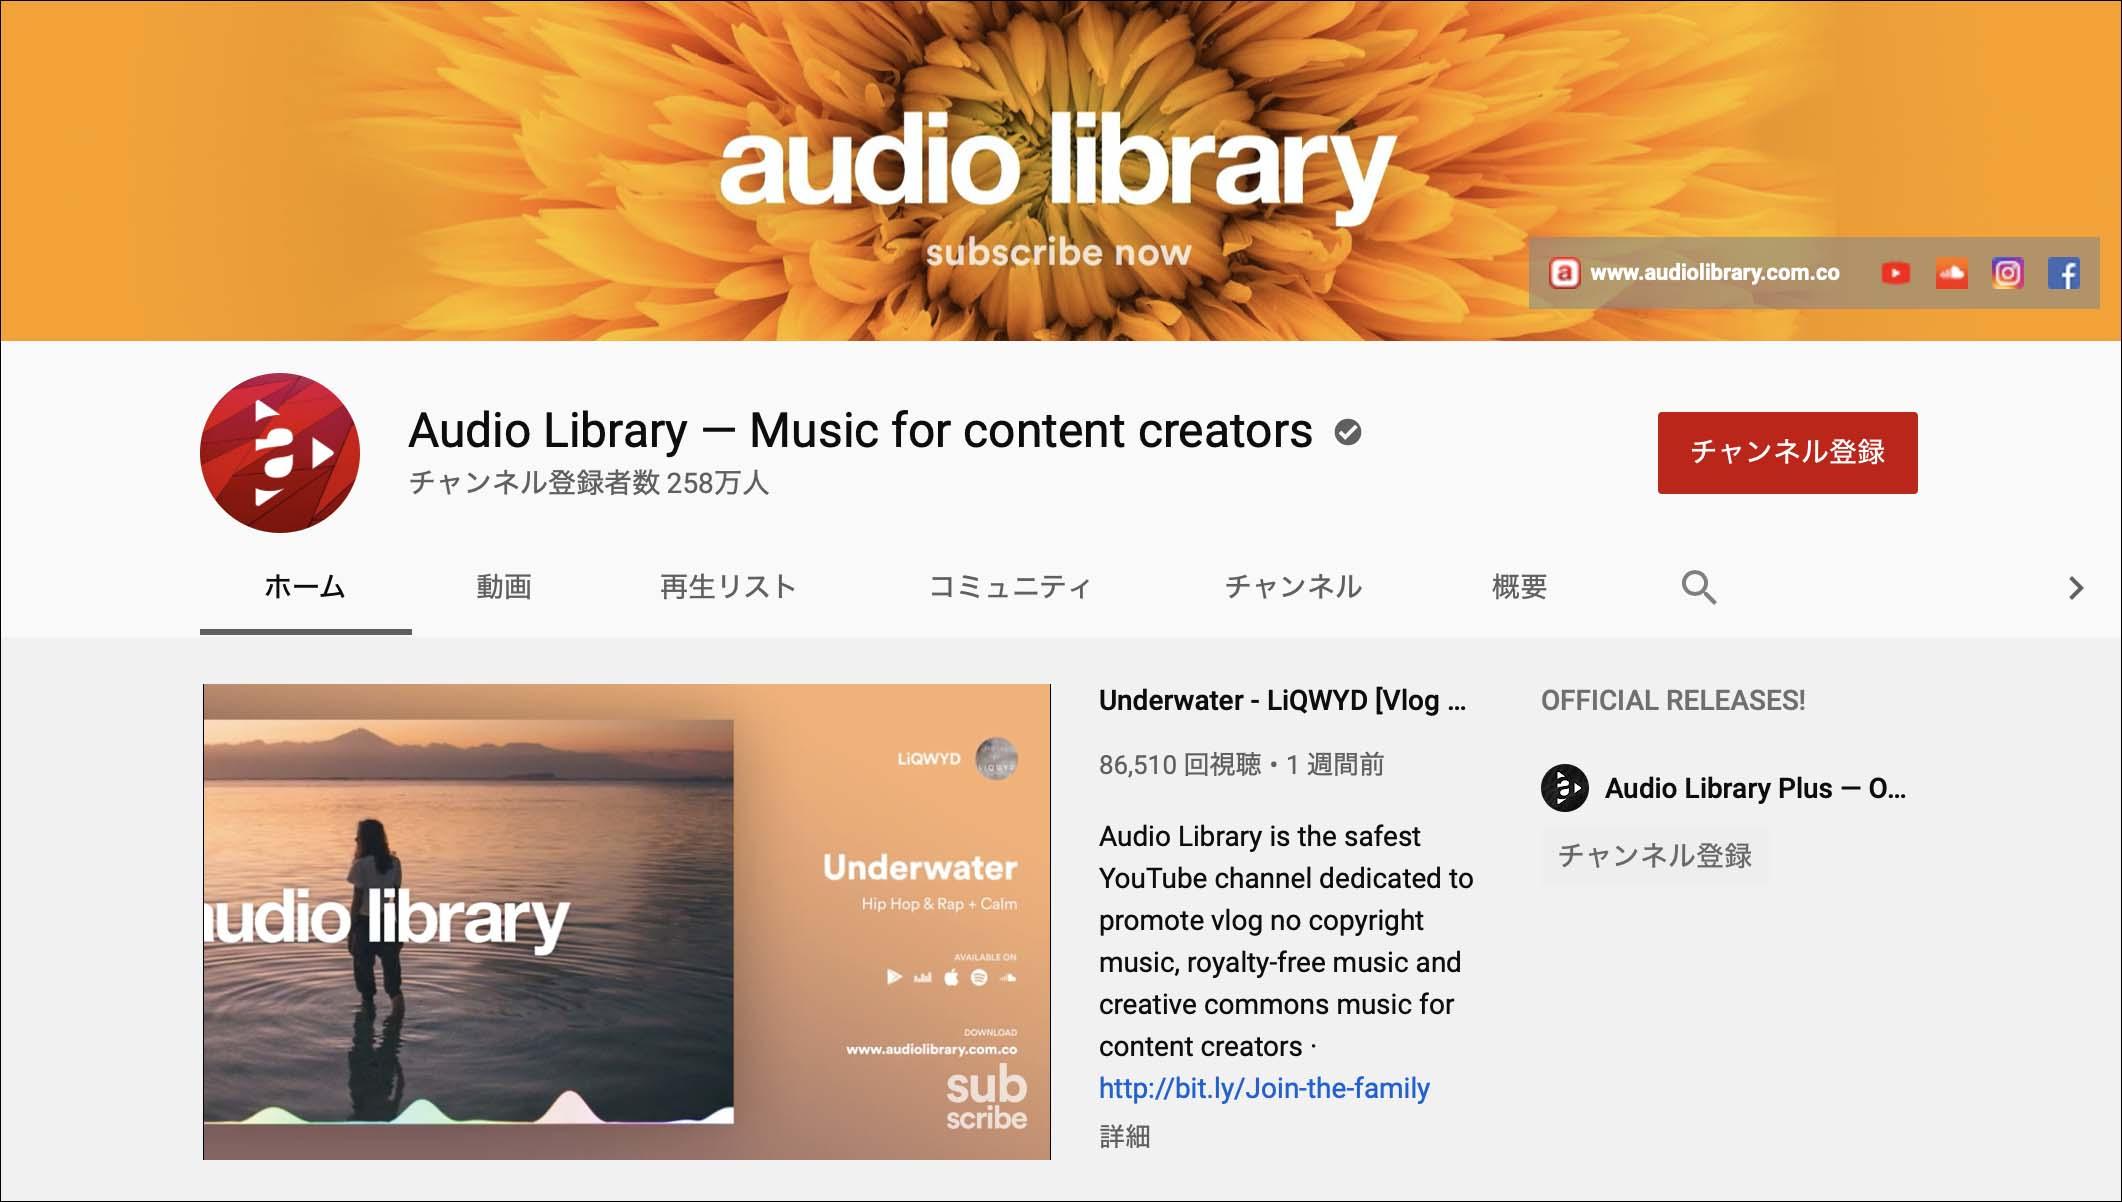 YouTubeで『no copyright music』を検索